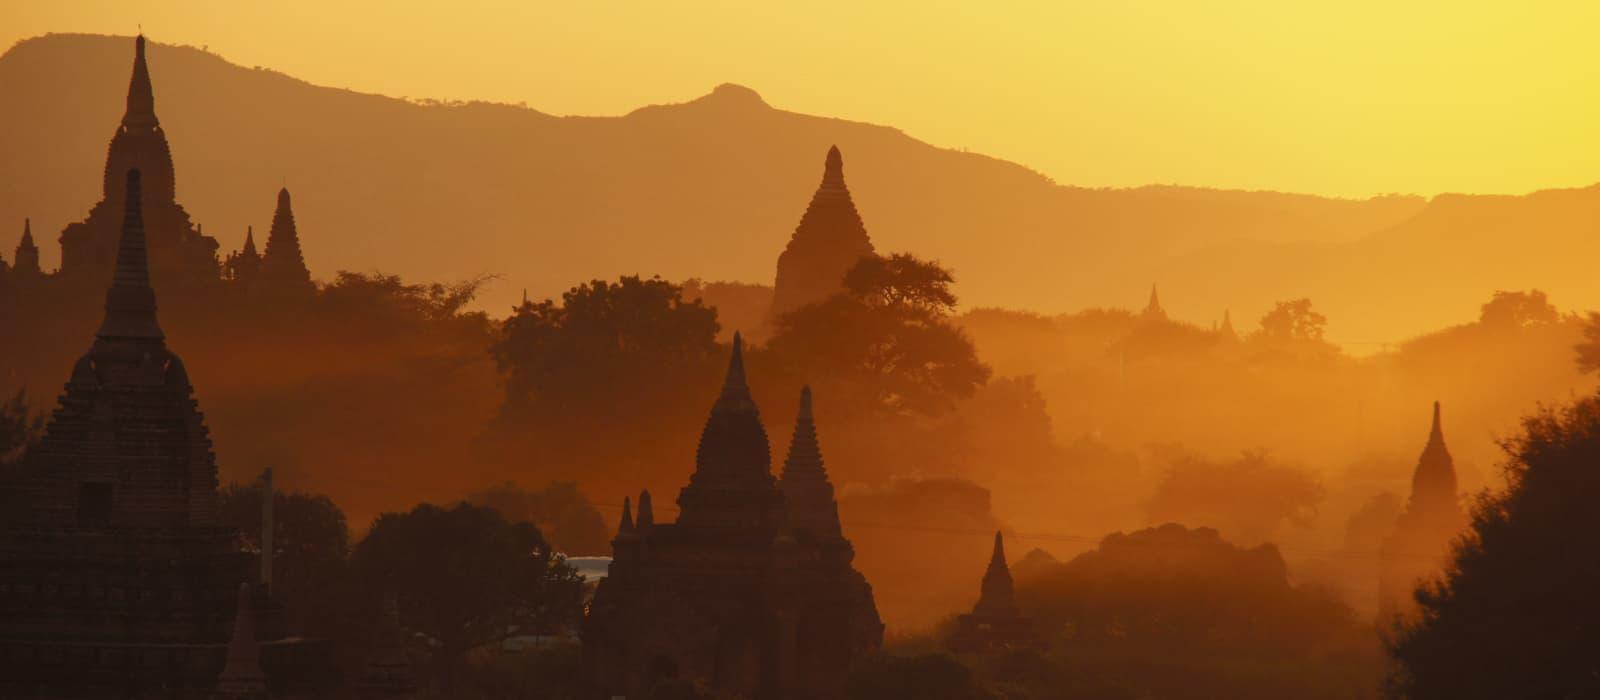 img-diapo-entete - Myanmar-1600x700-1.jpg